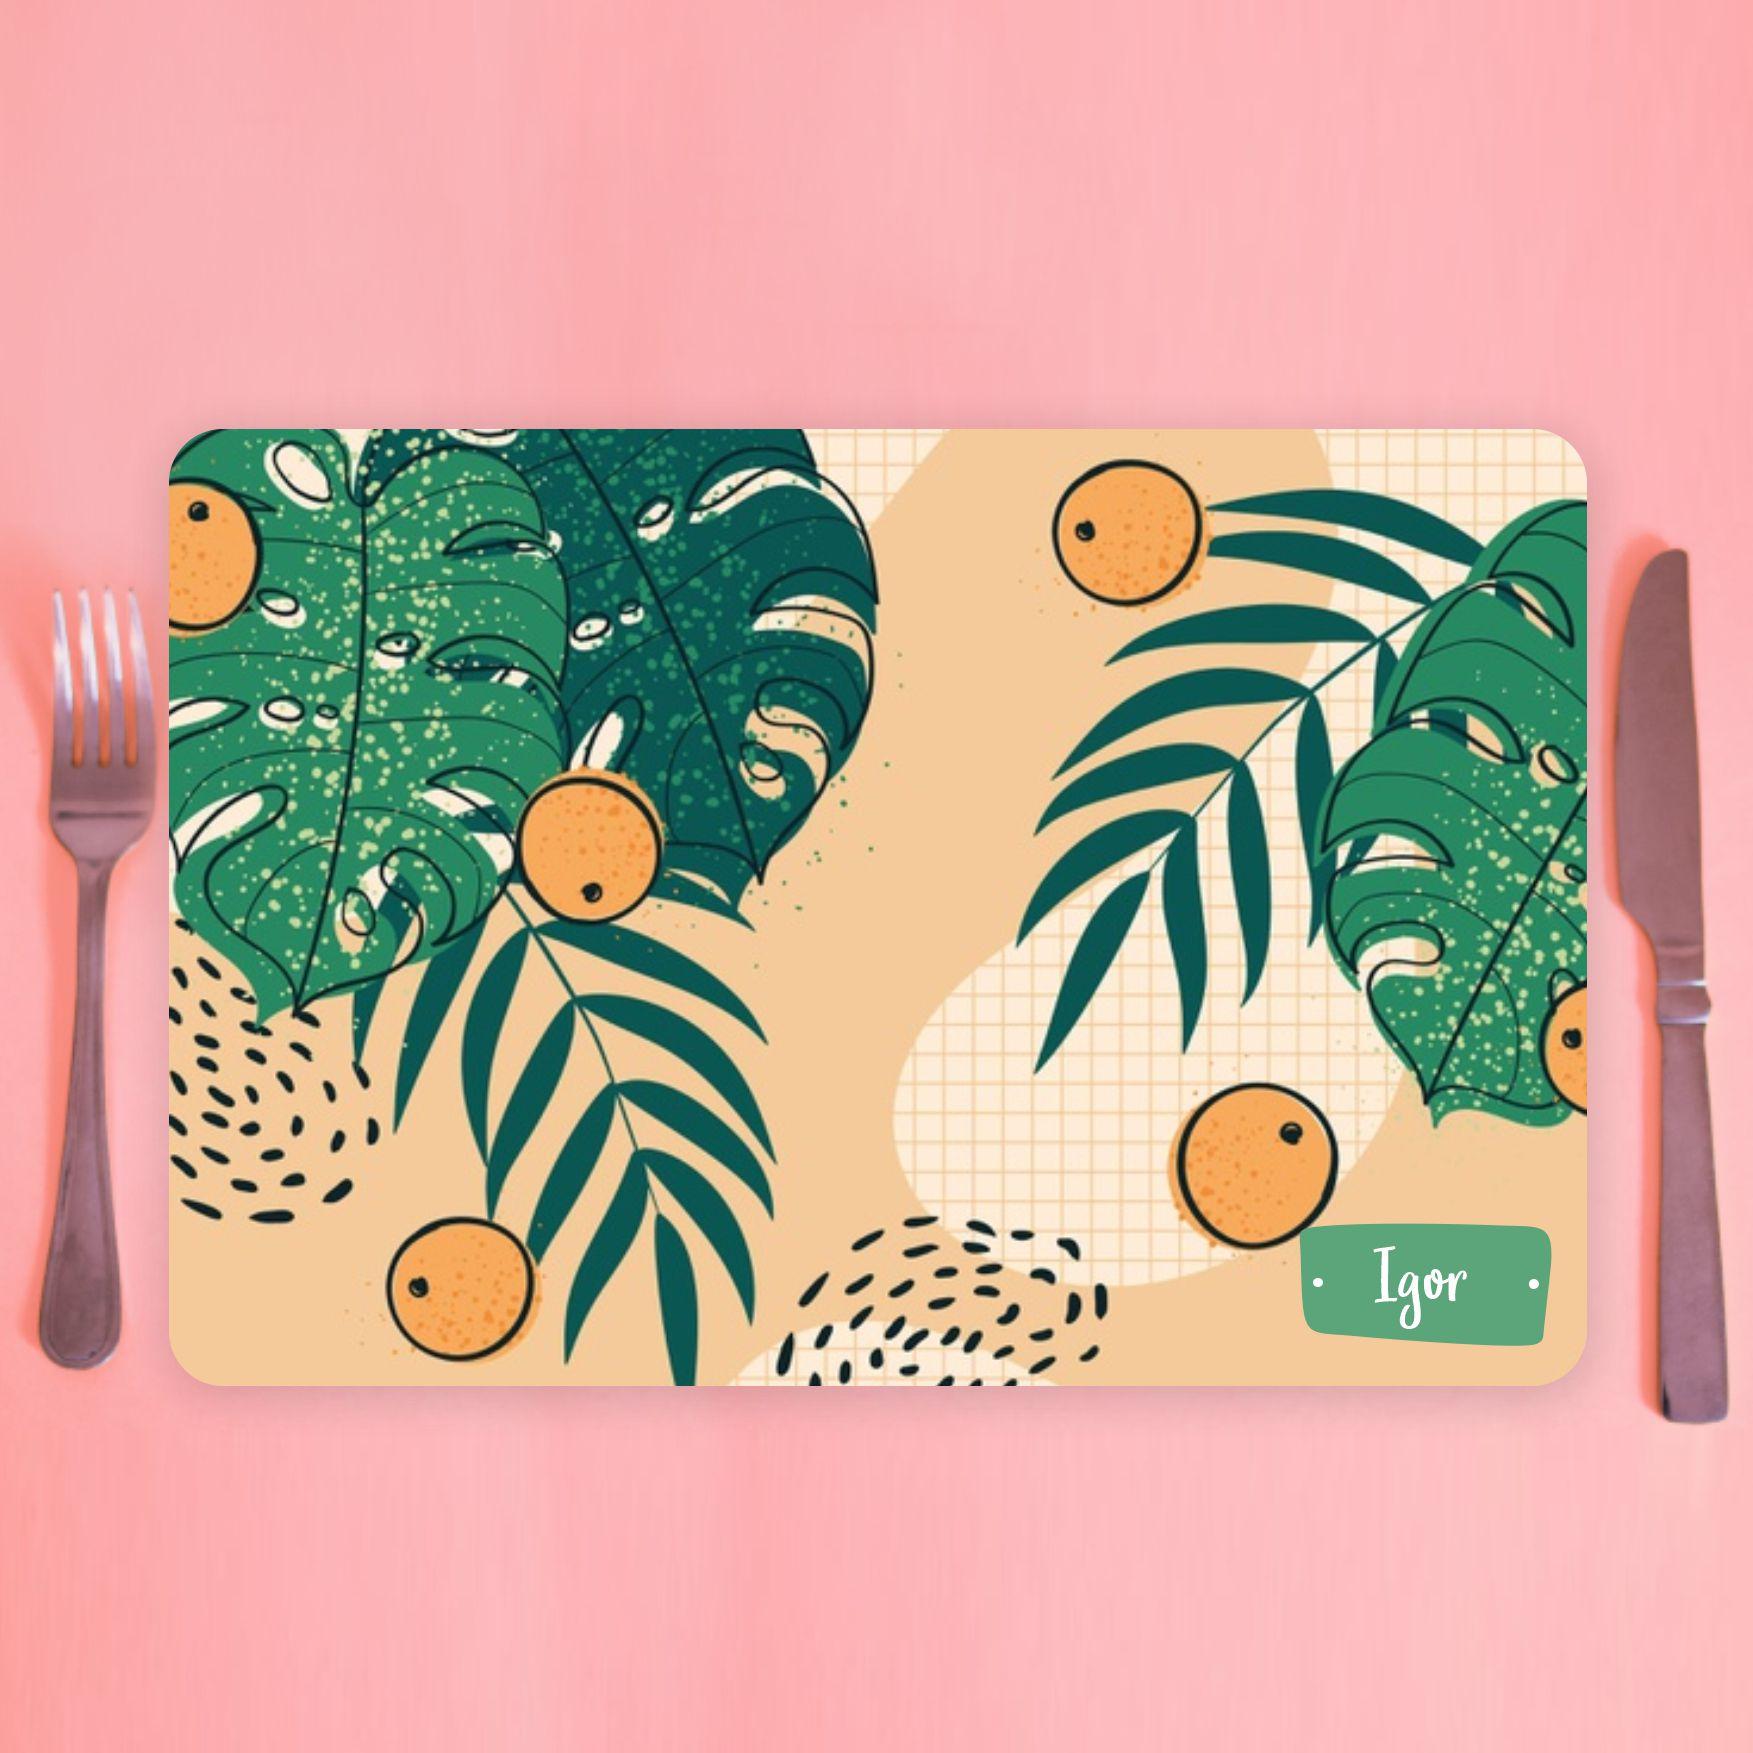 Jogo Americano Personalizado -ilustração orgânica laranja